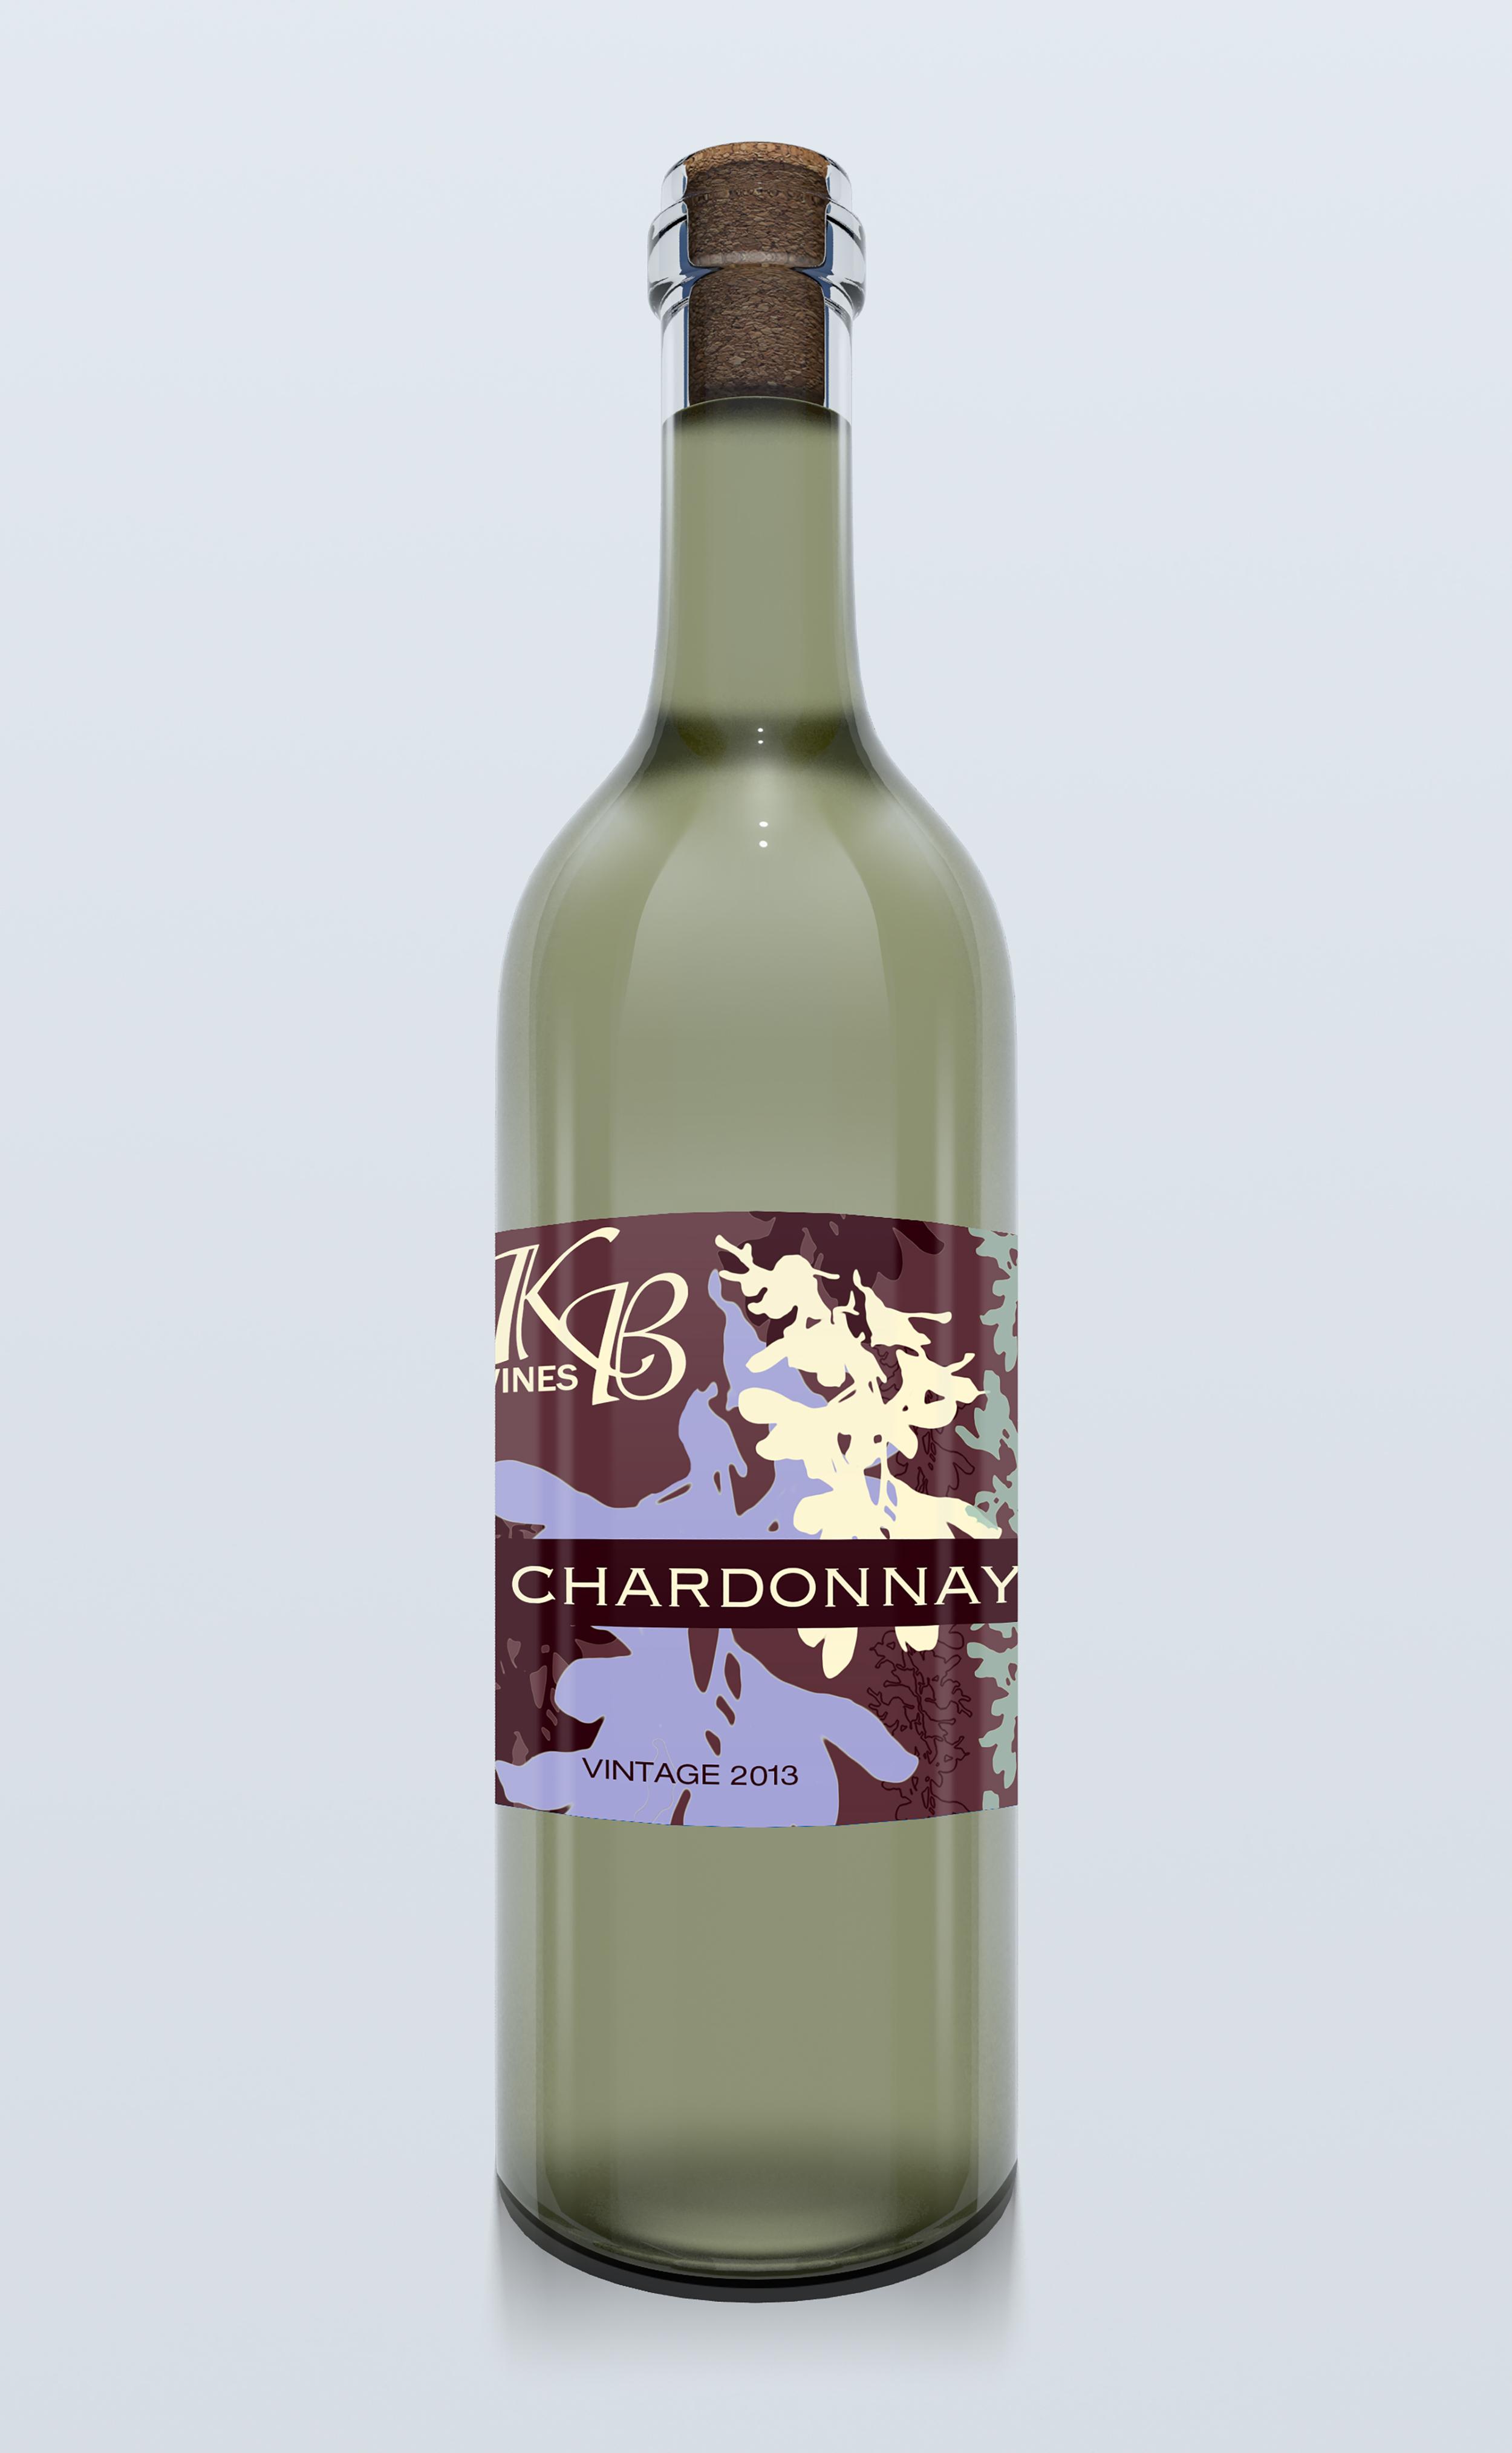 KB-Wines-Chardonnay-1.jpg